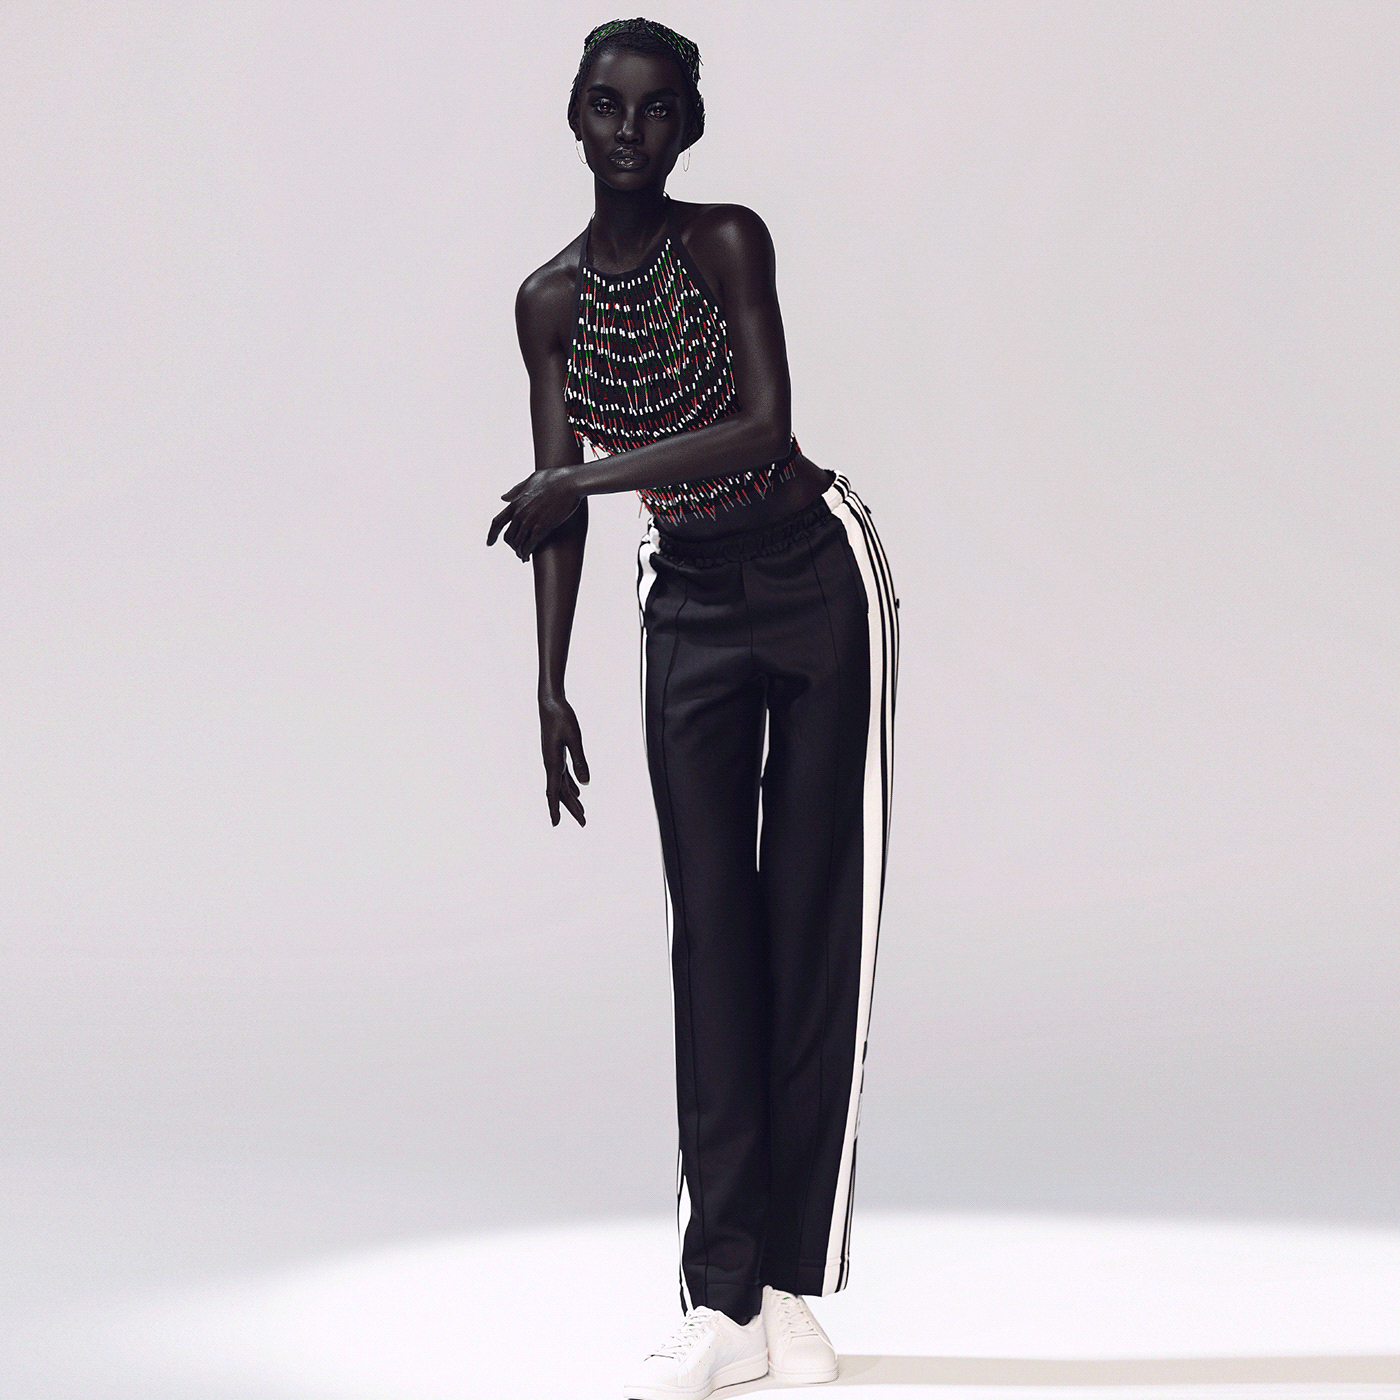 #3D #3dart #3ddesign #3dfashion #Design3D #editorial #Fashion #Fashion3D #moda3D #virtualfashion